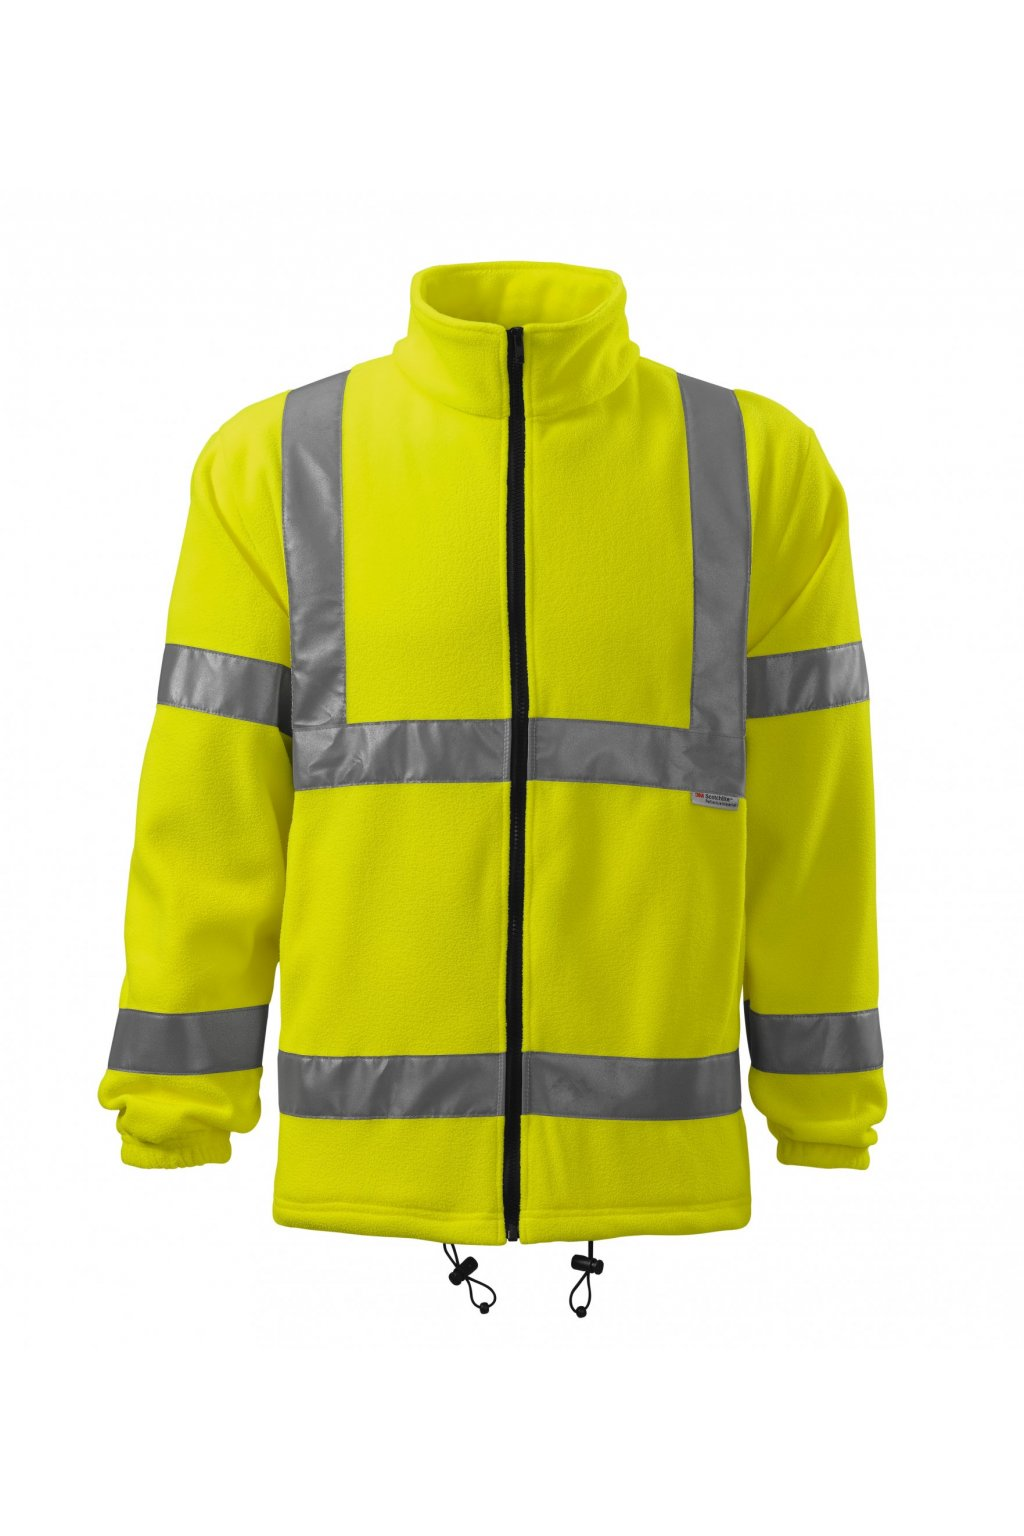 HV Fleece Jacket 5V1 Fleece unisex